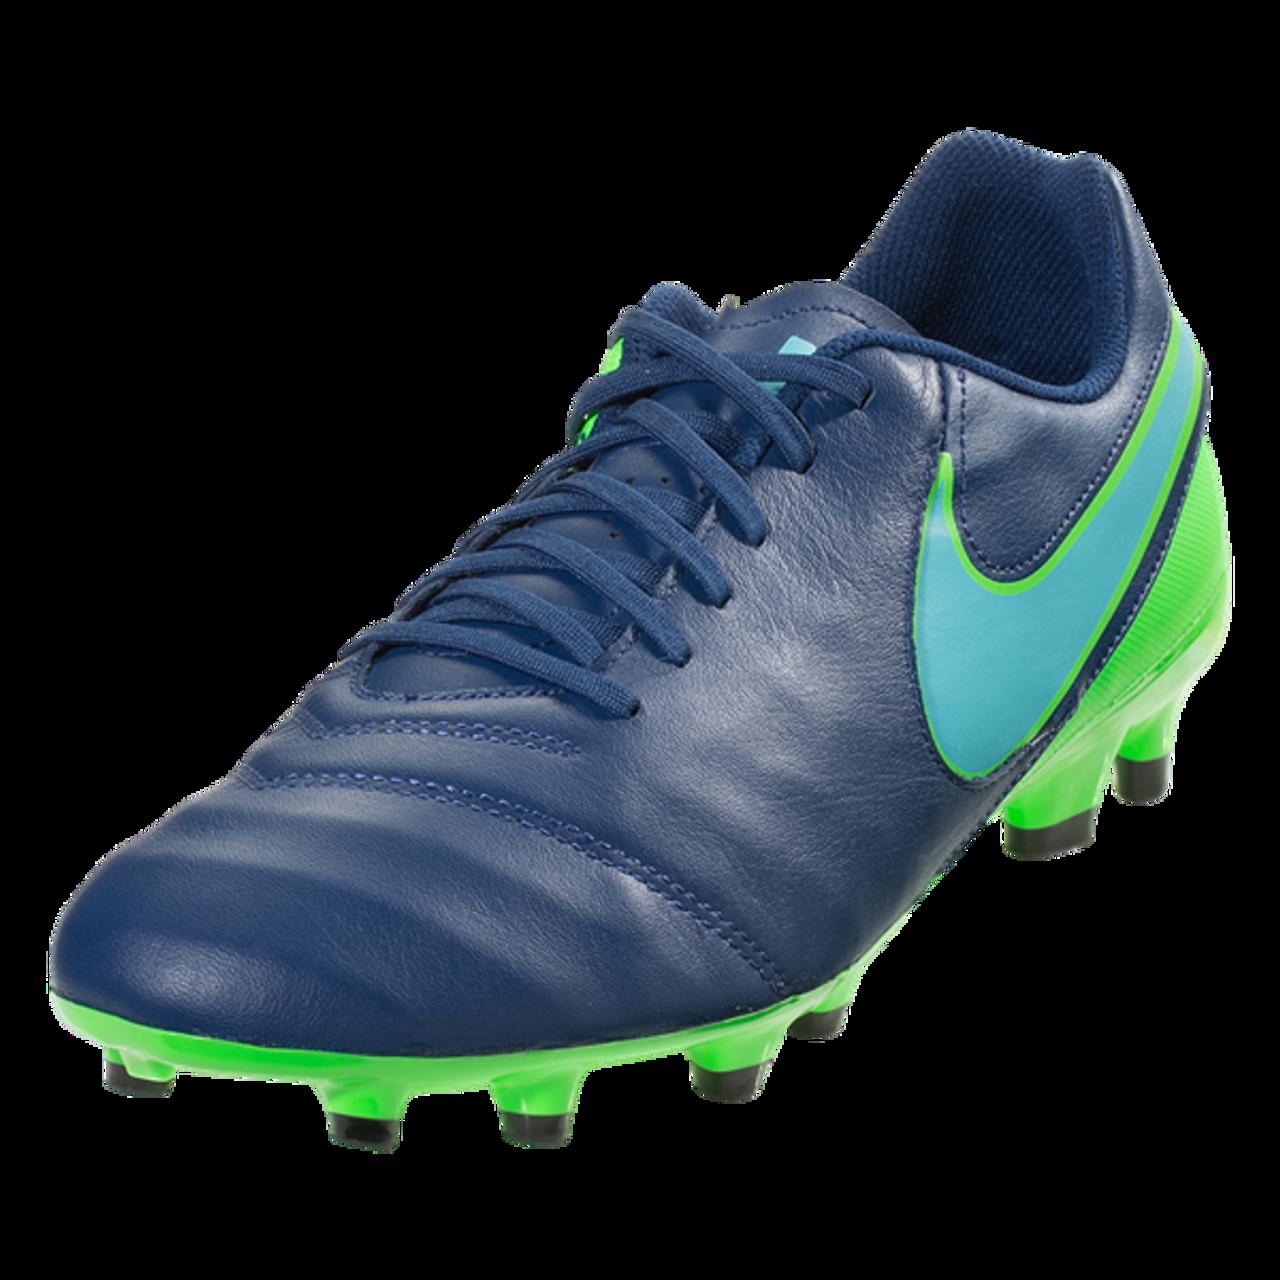 new style bade5 c92c0 Tiempo Genio II Leather FG - Coastal Blue Polarized Blue Rage Green  (112917) - ohp soccer